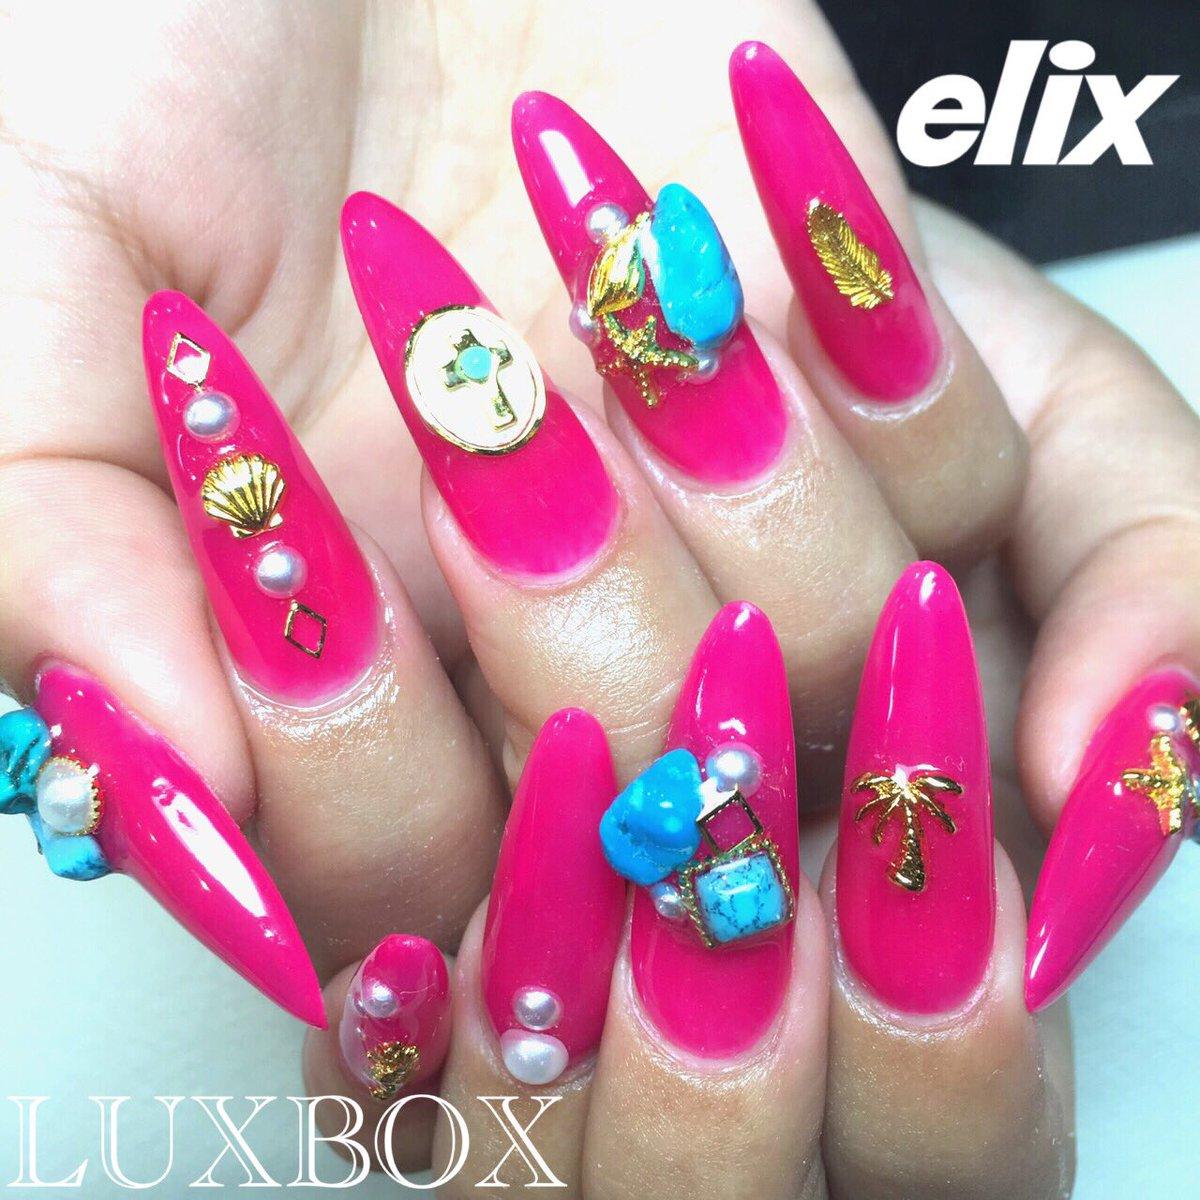 nail nailist nails japannail beauty japan 渋谷 ネイル ネイリスト 佐久間恵利 LUXBOX LUXBOX渋谷店